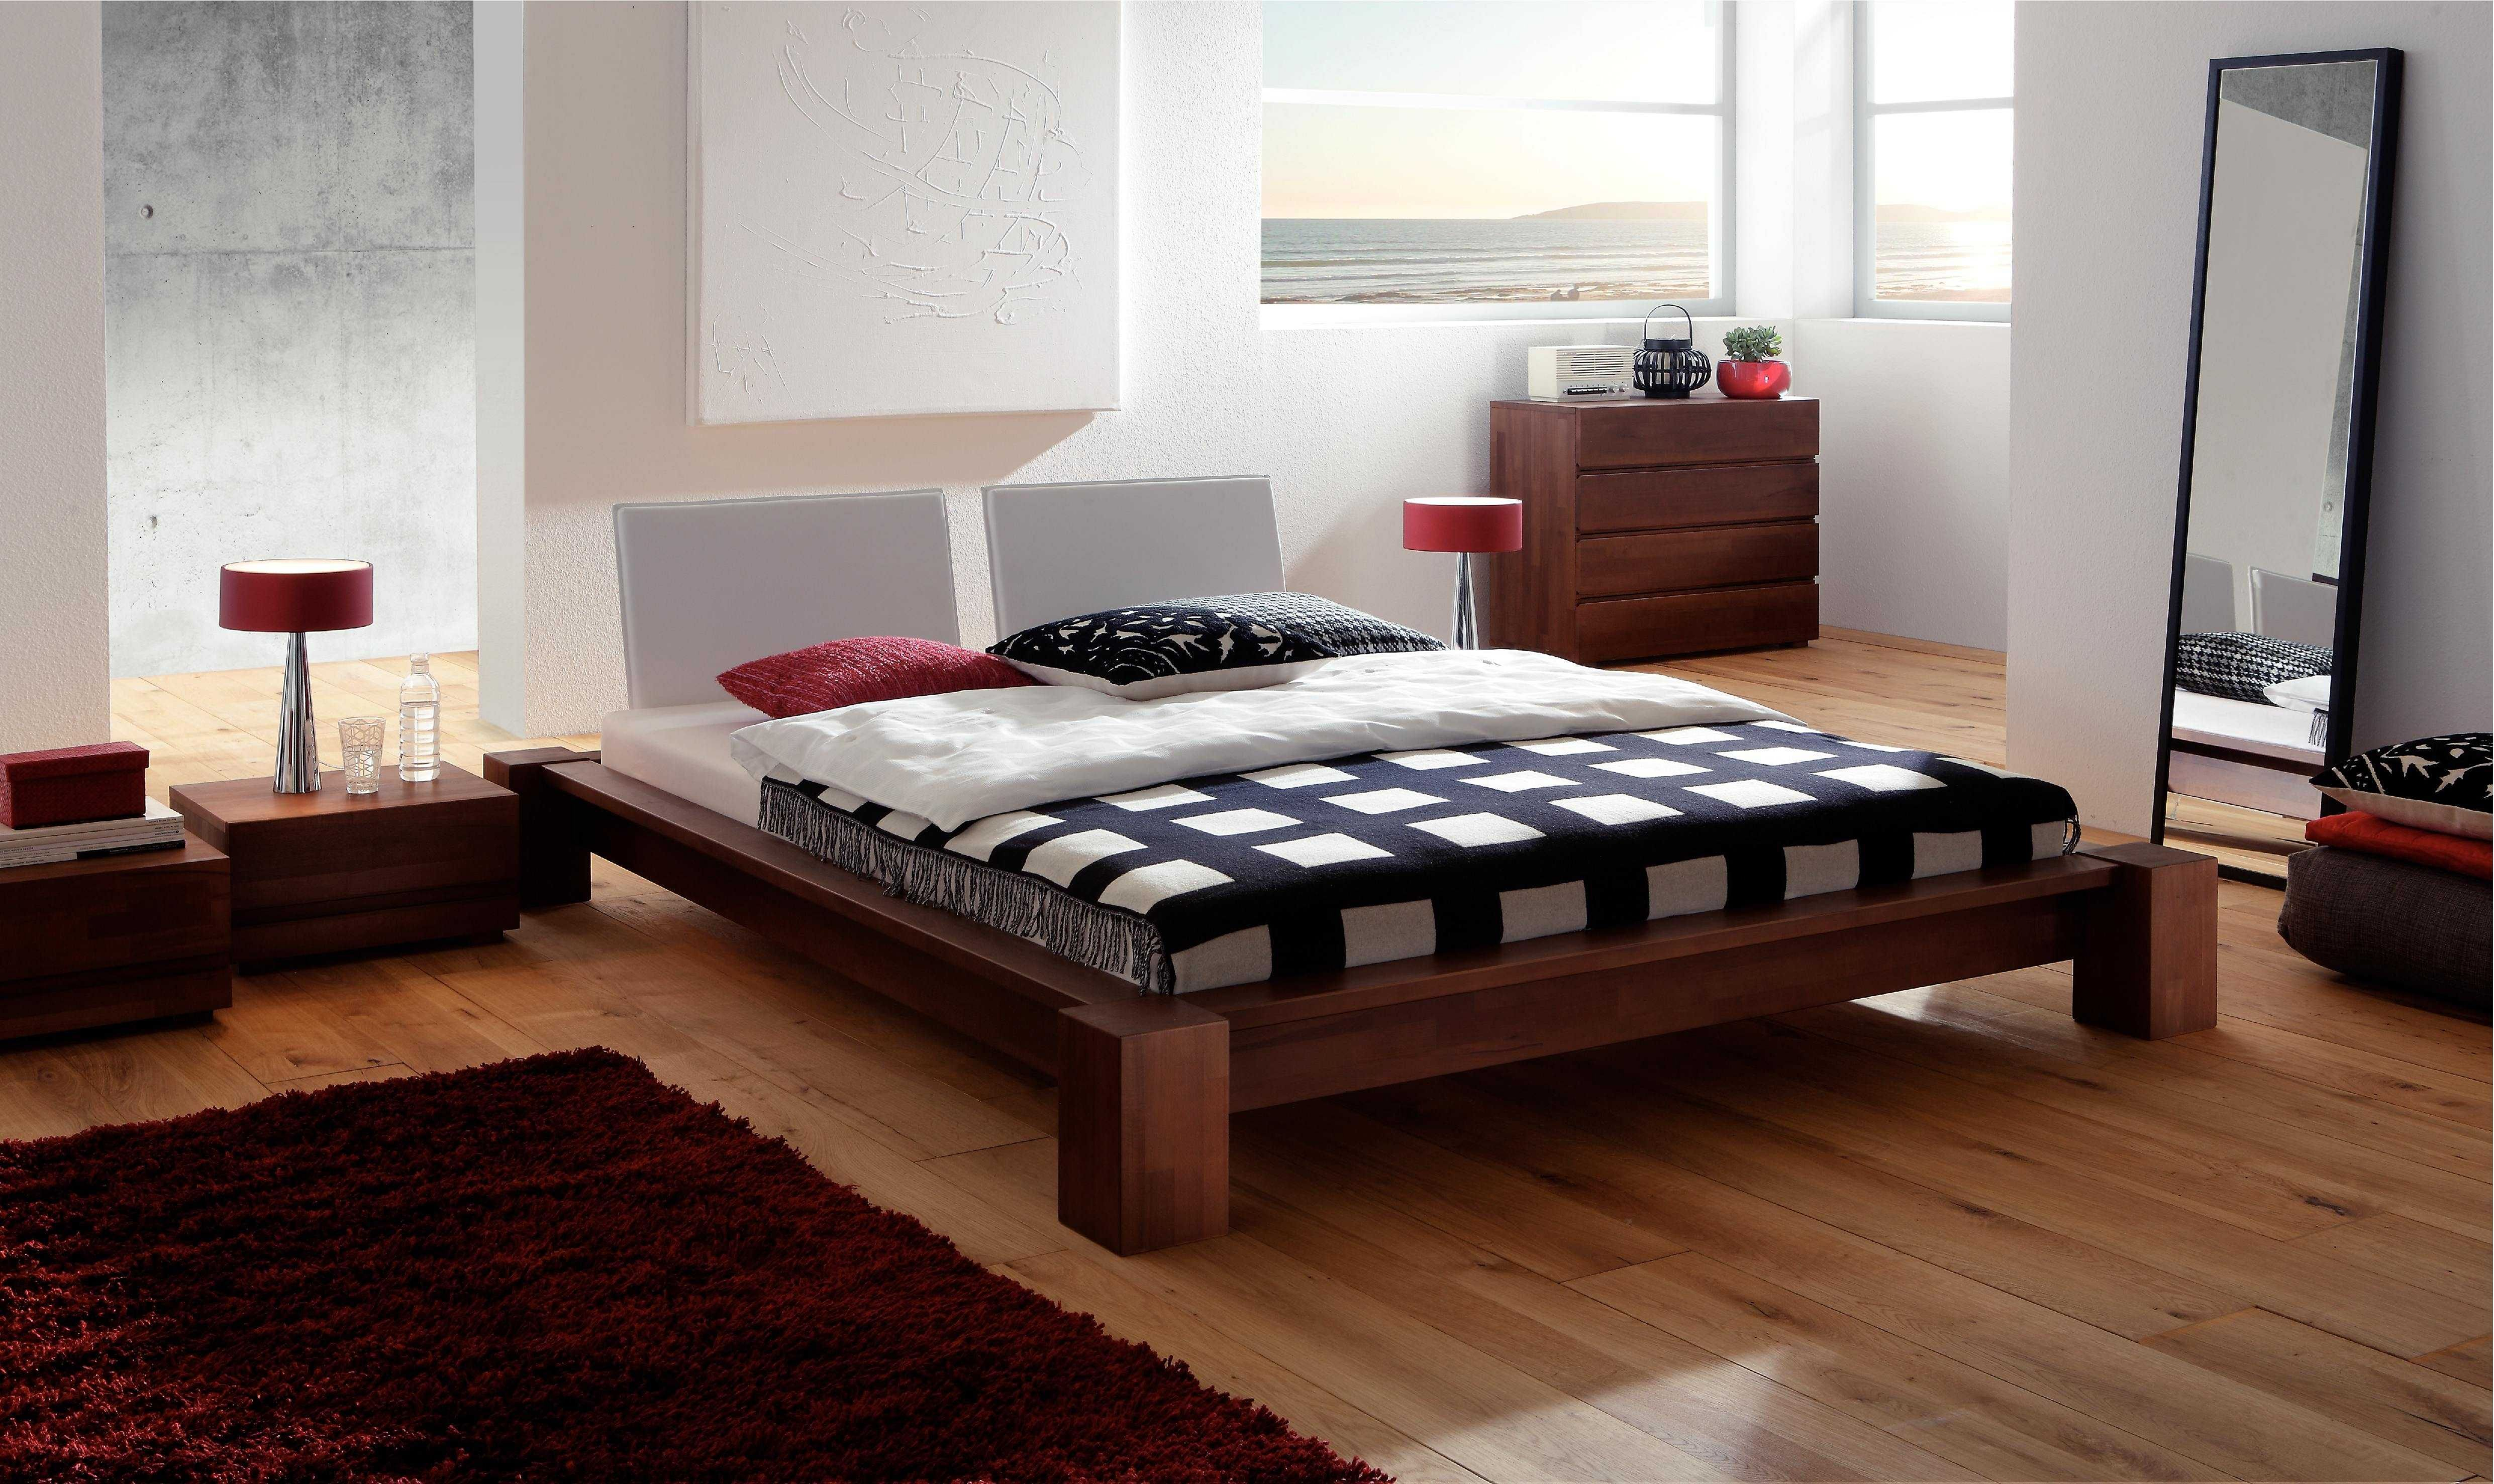 10 Best Modern Japanese Bedroom Designs for Quiet Sleep